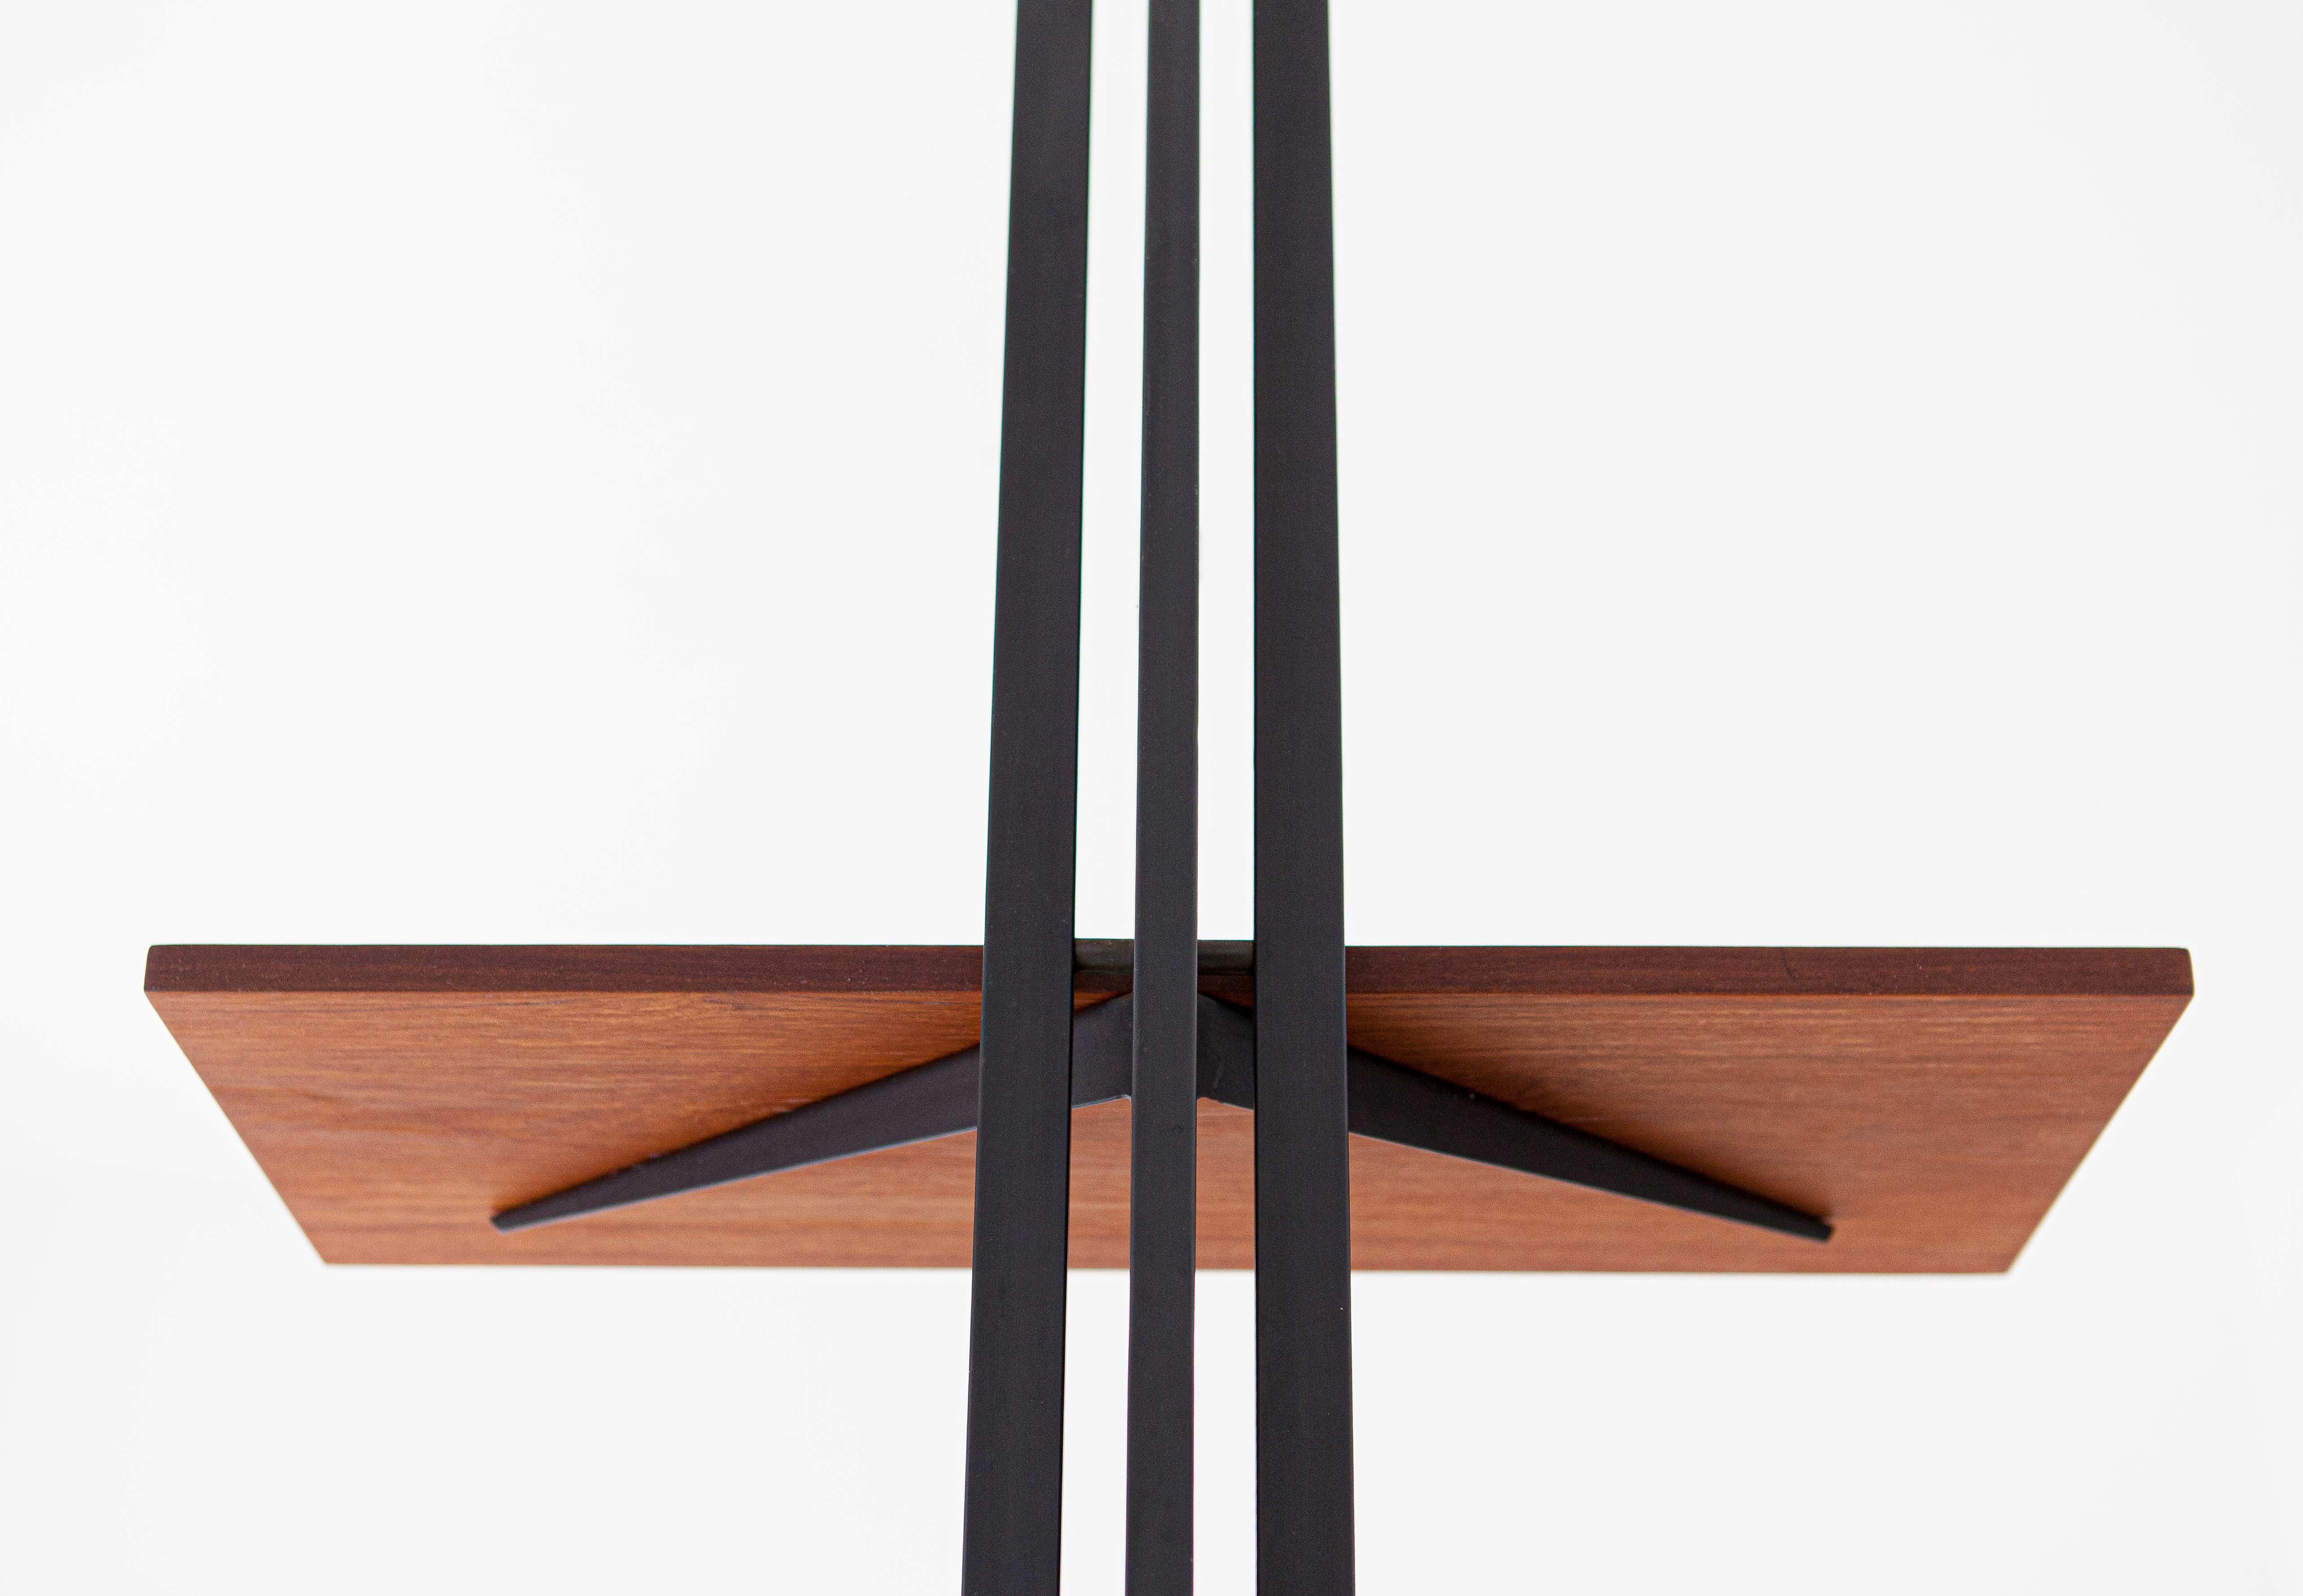 950s-italian-single-pole-floor-to-ceiling-bookshelf-6-wu37.jpg